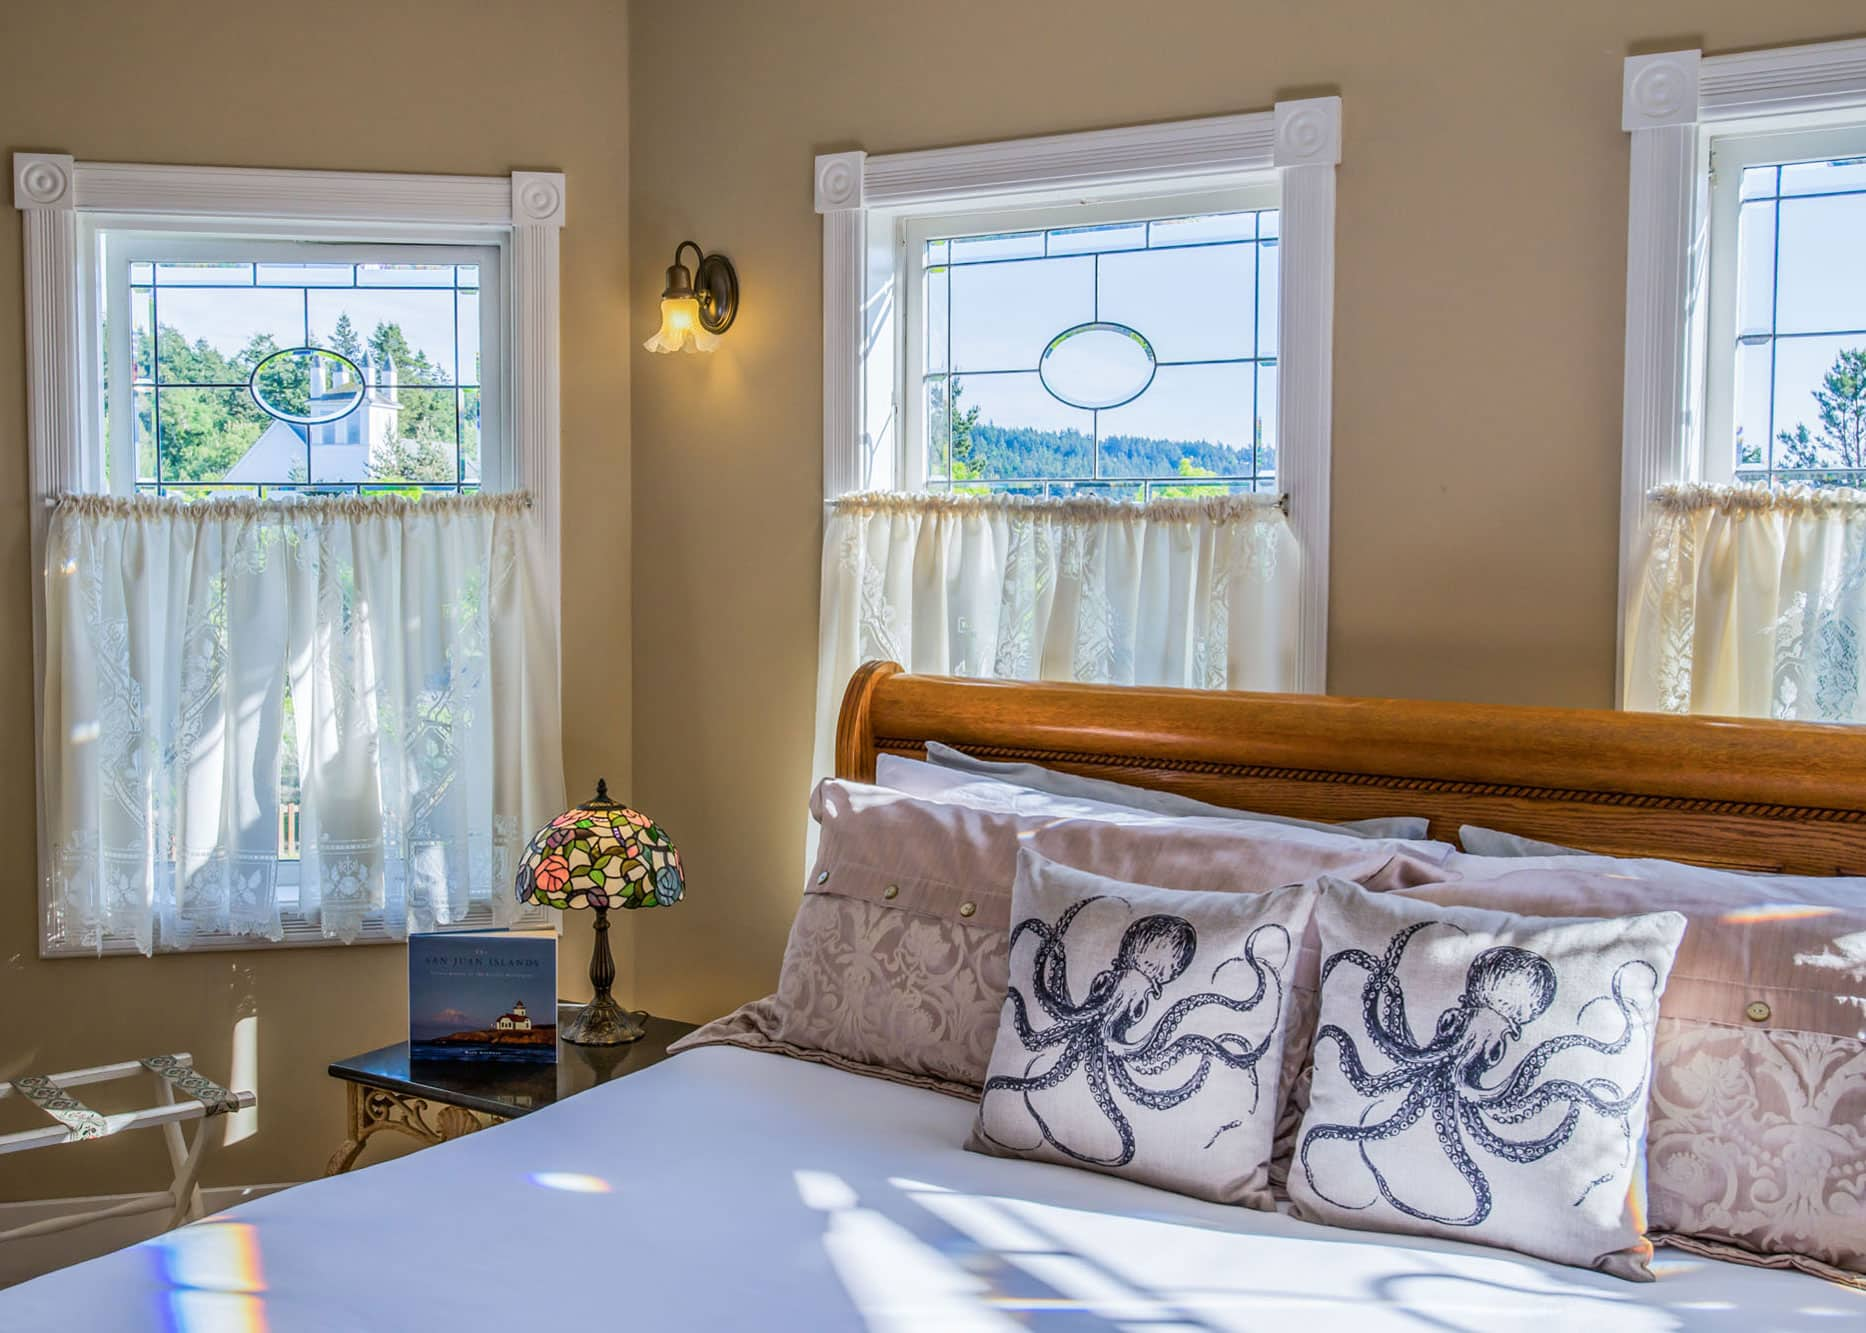 the-edenwild-inn-lopez-island-lodging-2020-room-06-03